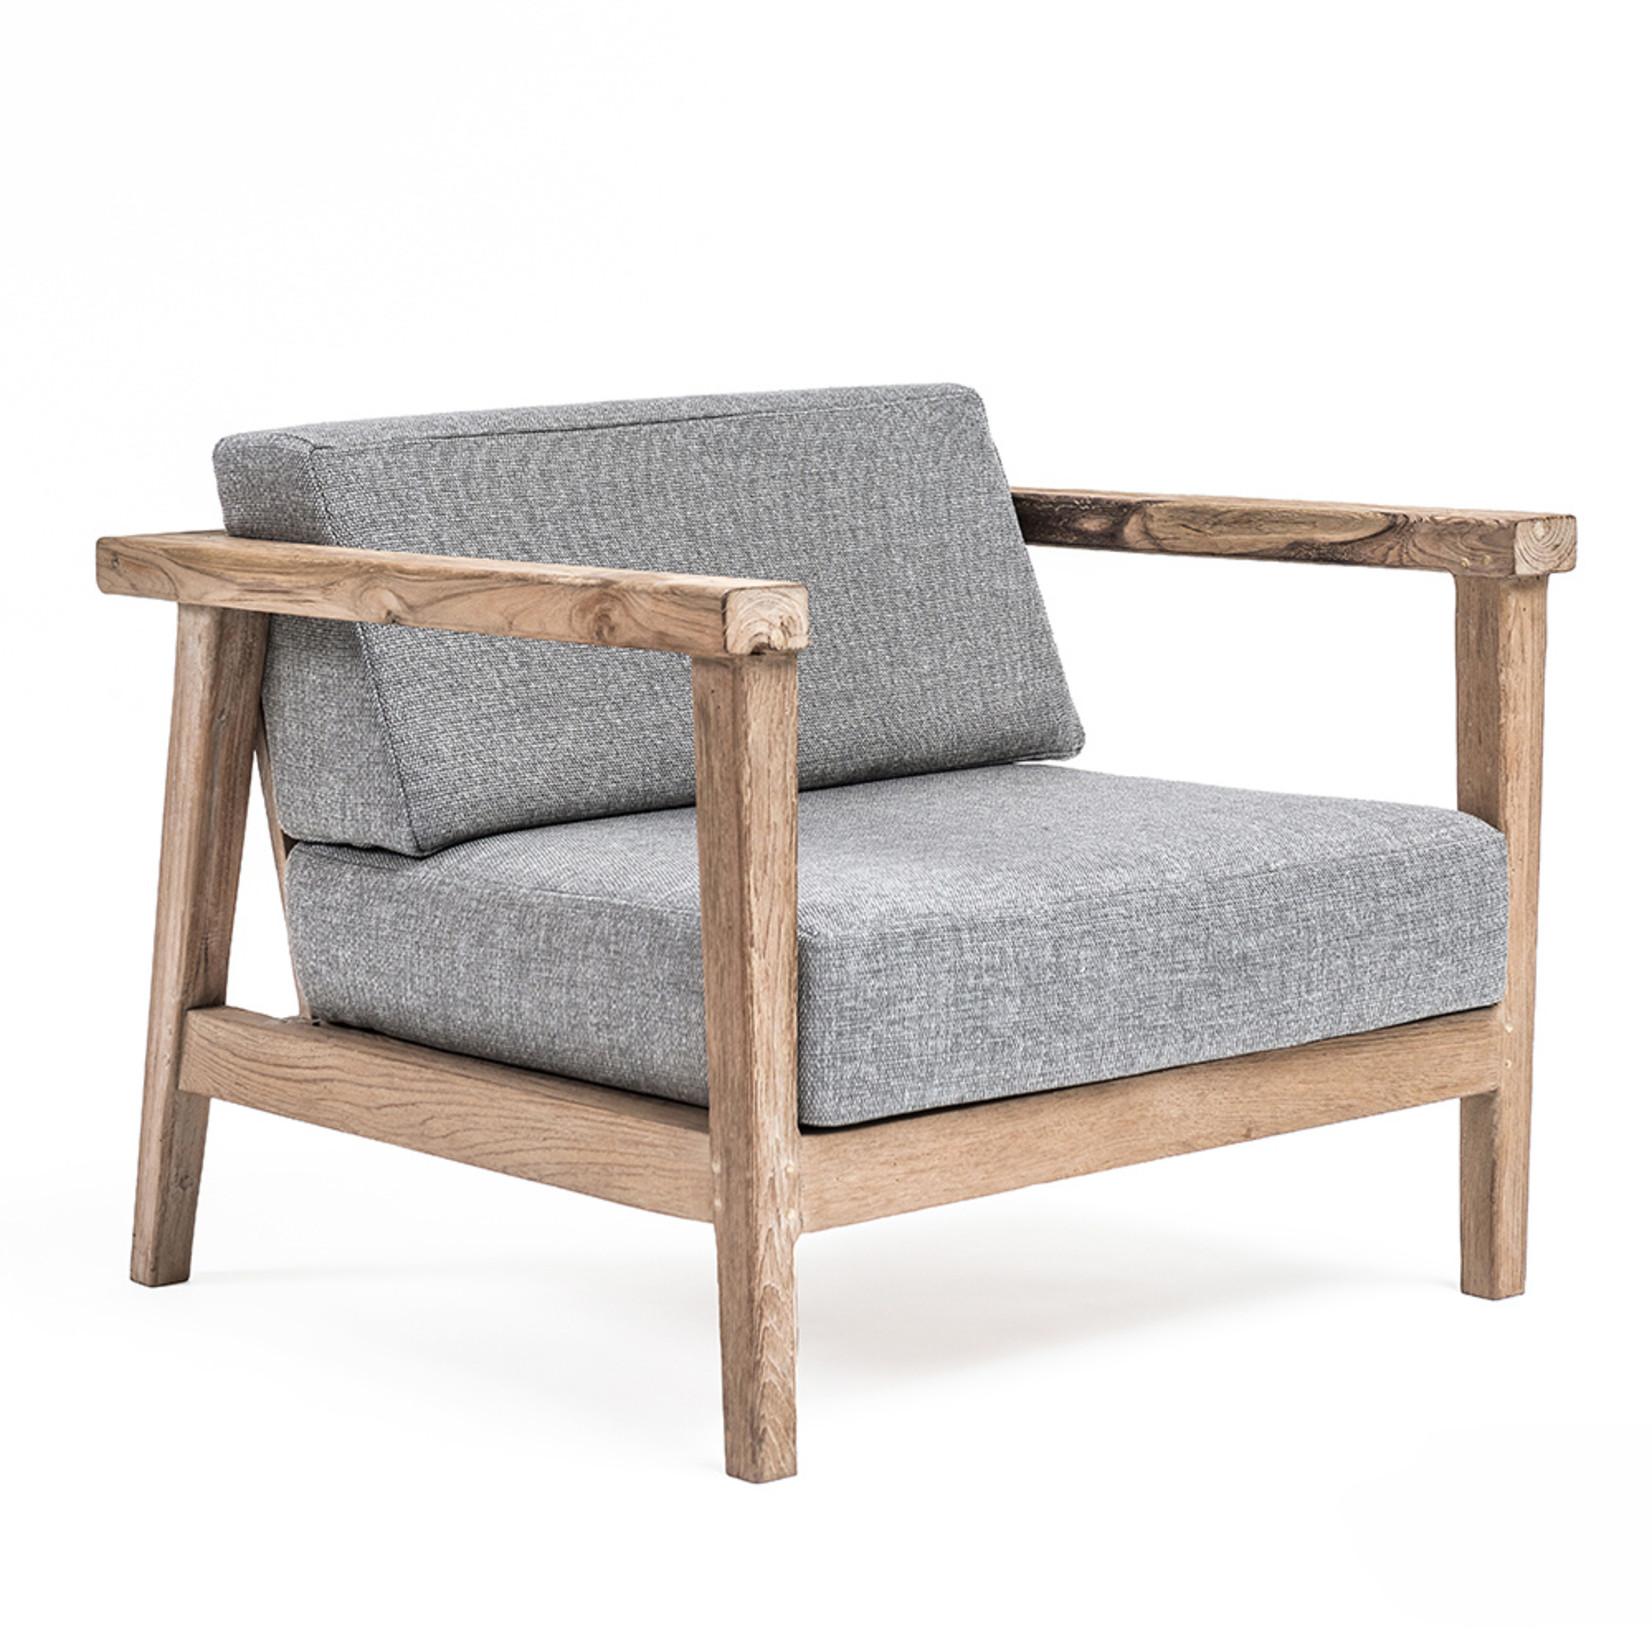 Gommaire 1-Seater Copenhague | Reclaimed Teak Natural Grey + Cushion